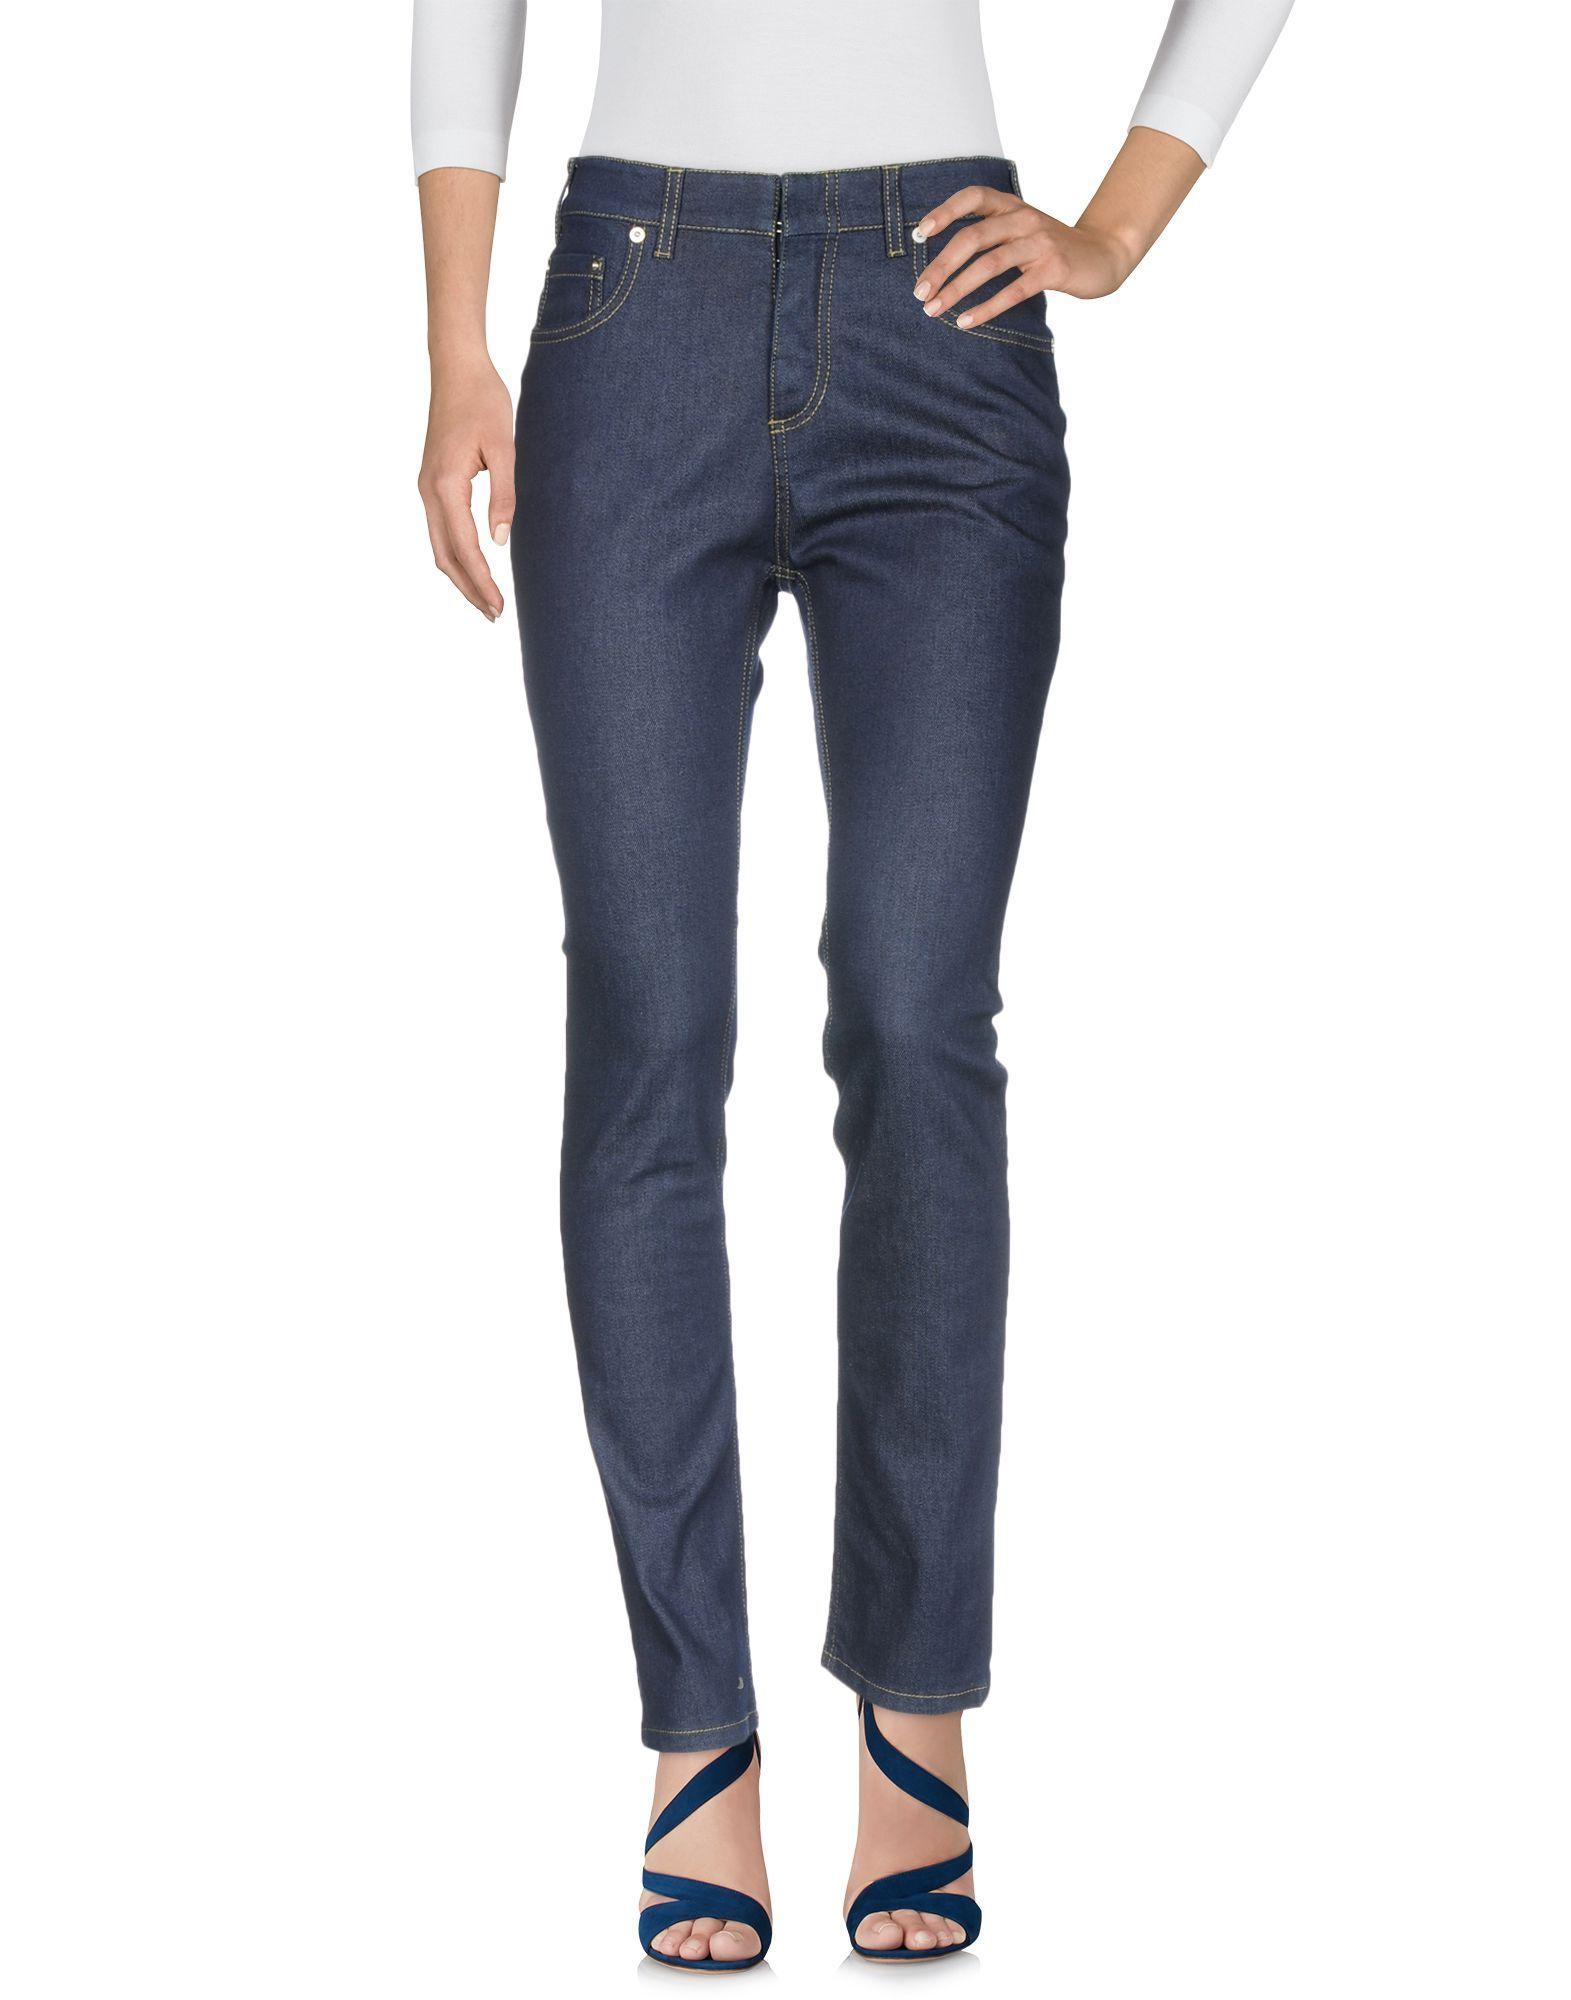 Philosophy Di Lorenzo Serafini Blue Cotton Jeans